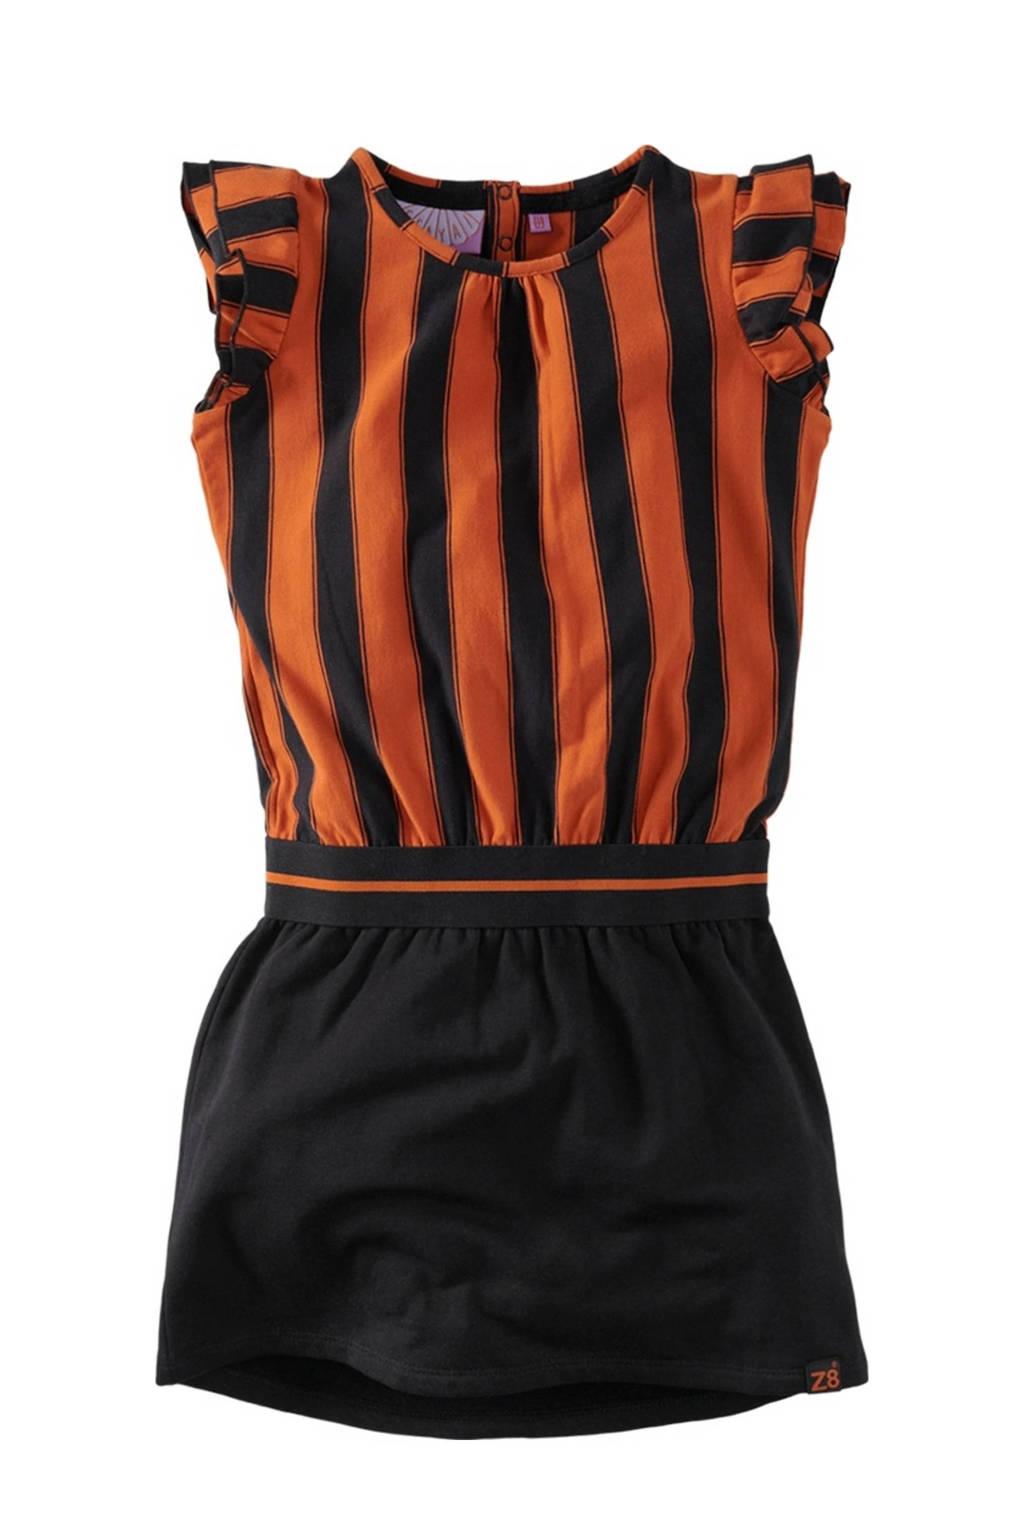 Z8 gestreepte jurk Claudette zwart/roestbruin